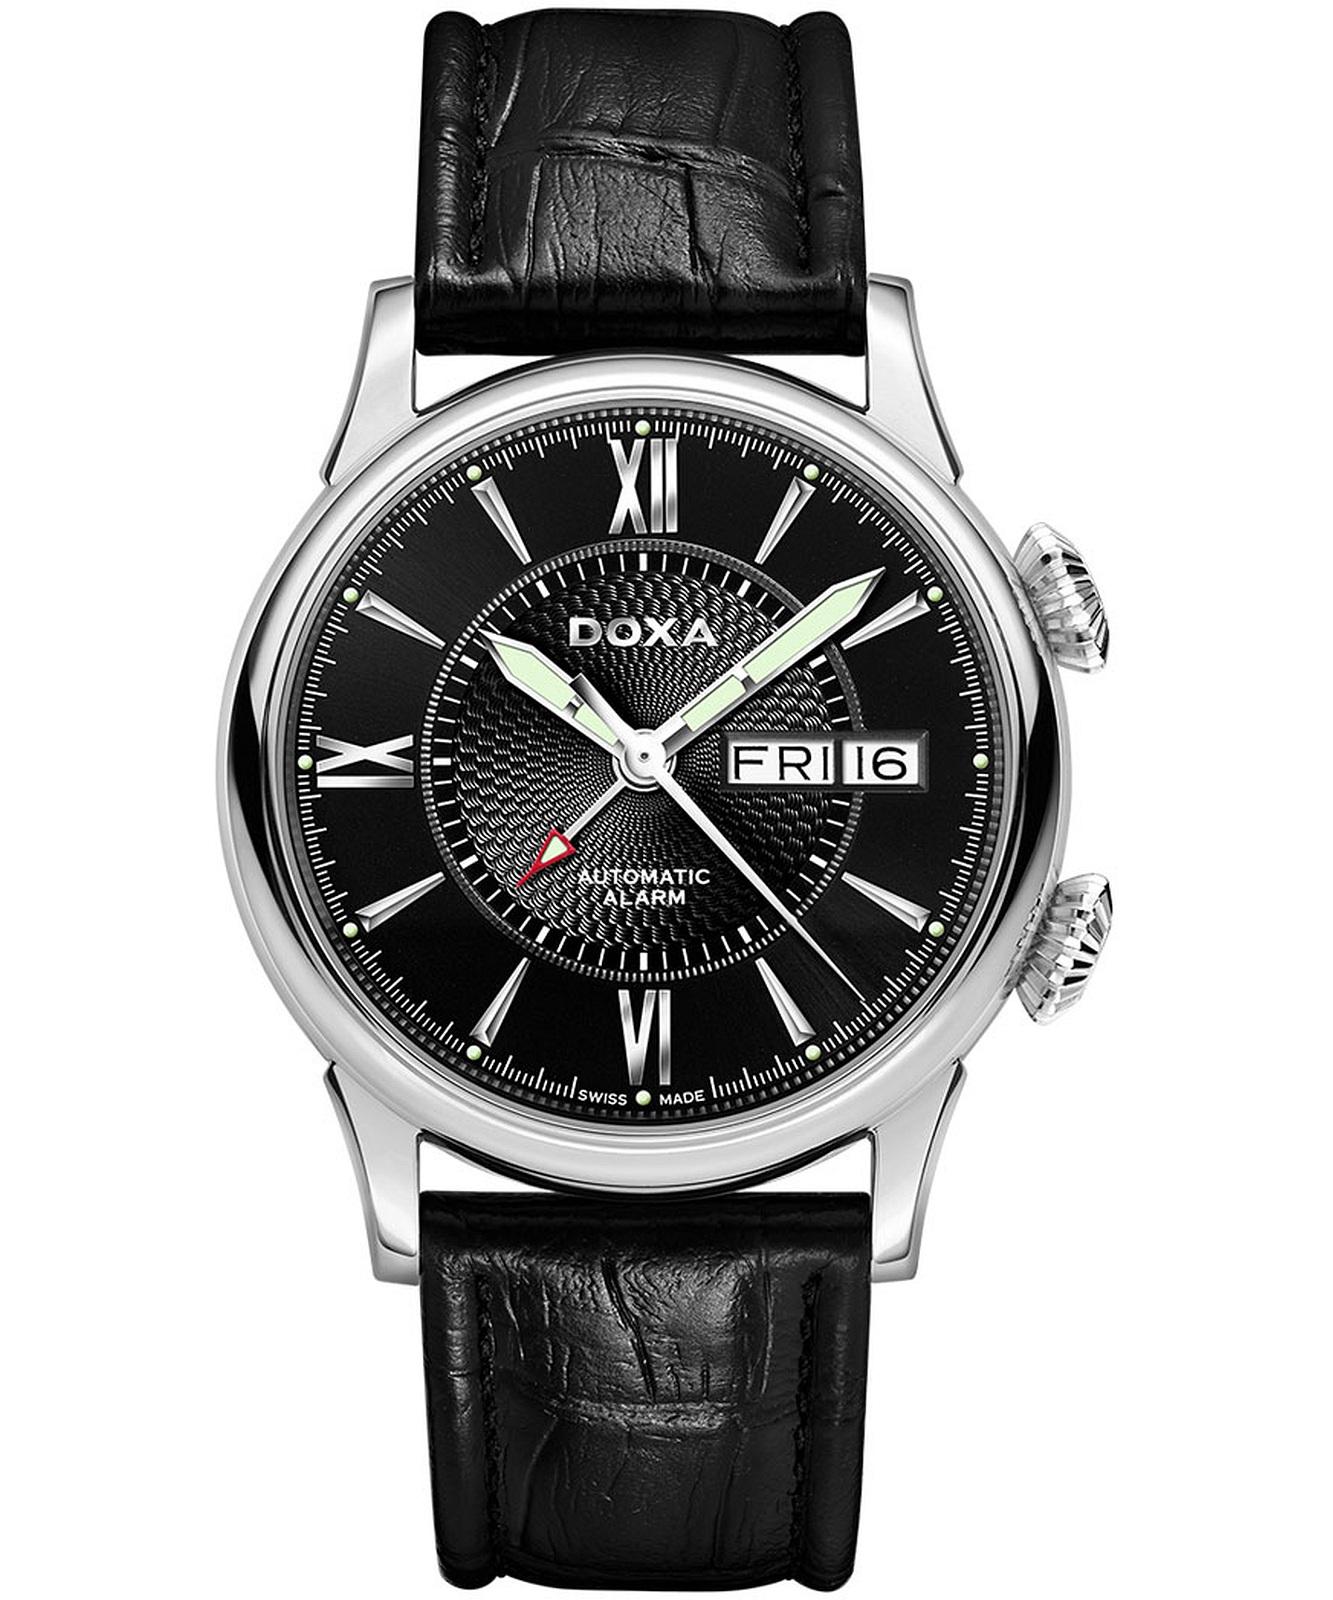 zegarek-meski-doxa-vintage-fusion-alarm-automatic-limited-edition-625-10-102-01